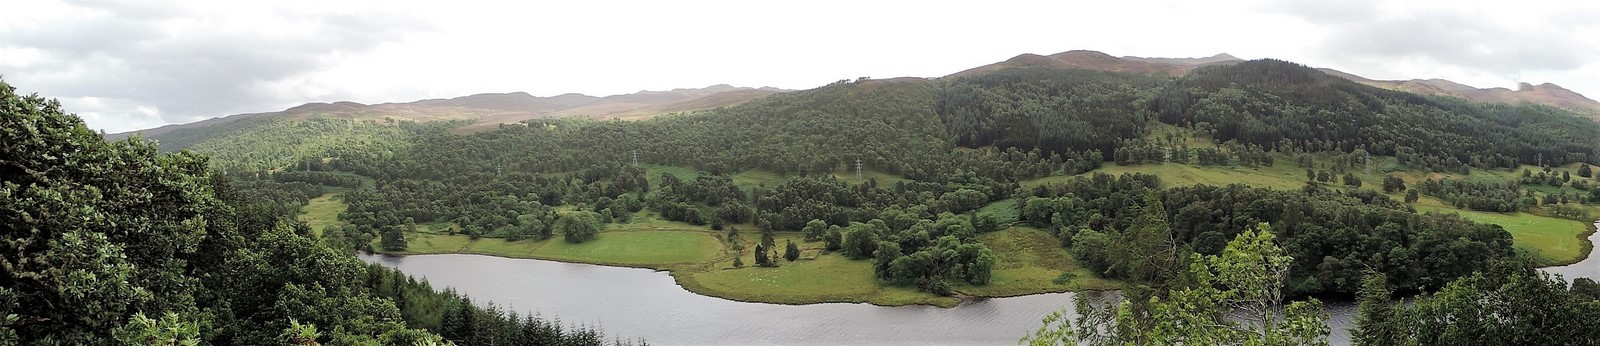 Voyage, voyage: Queen's view et Pitlochry (Ecosse)